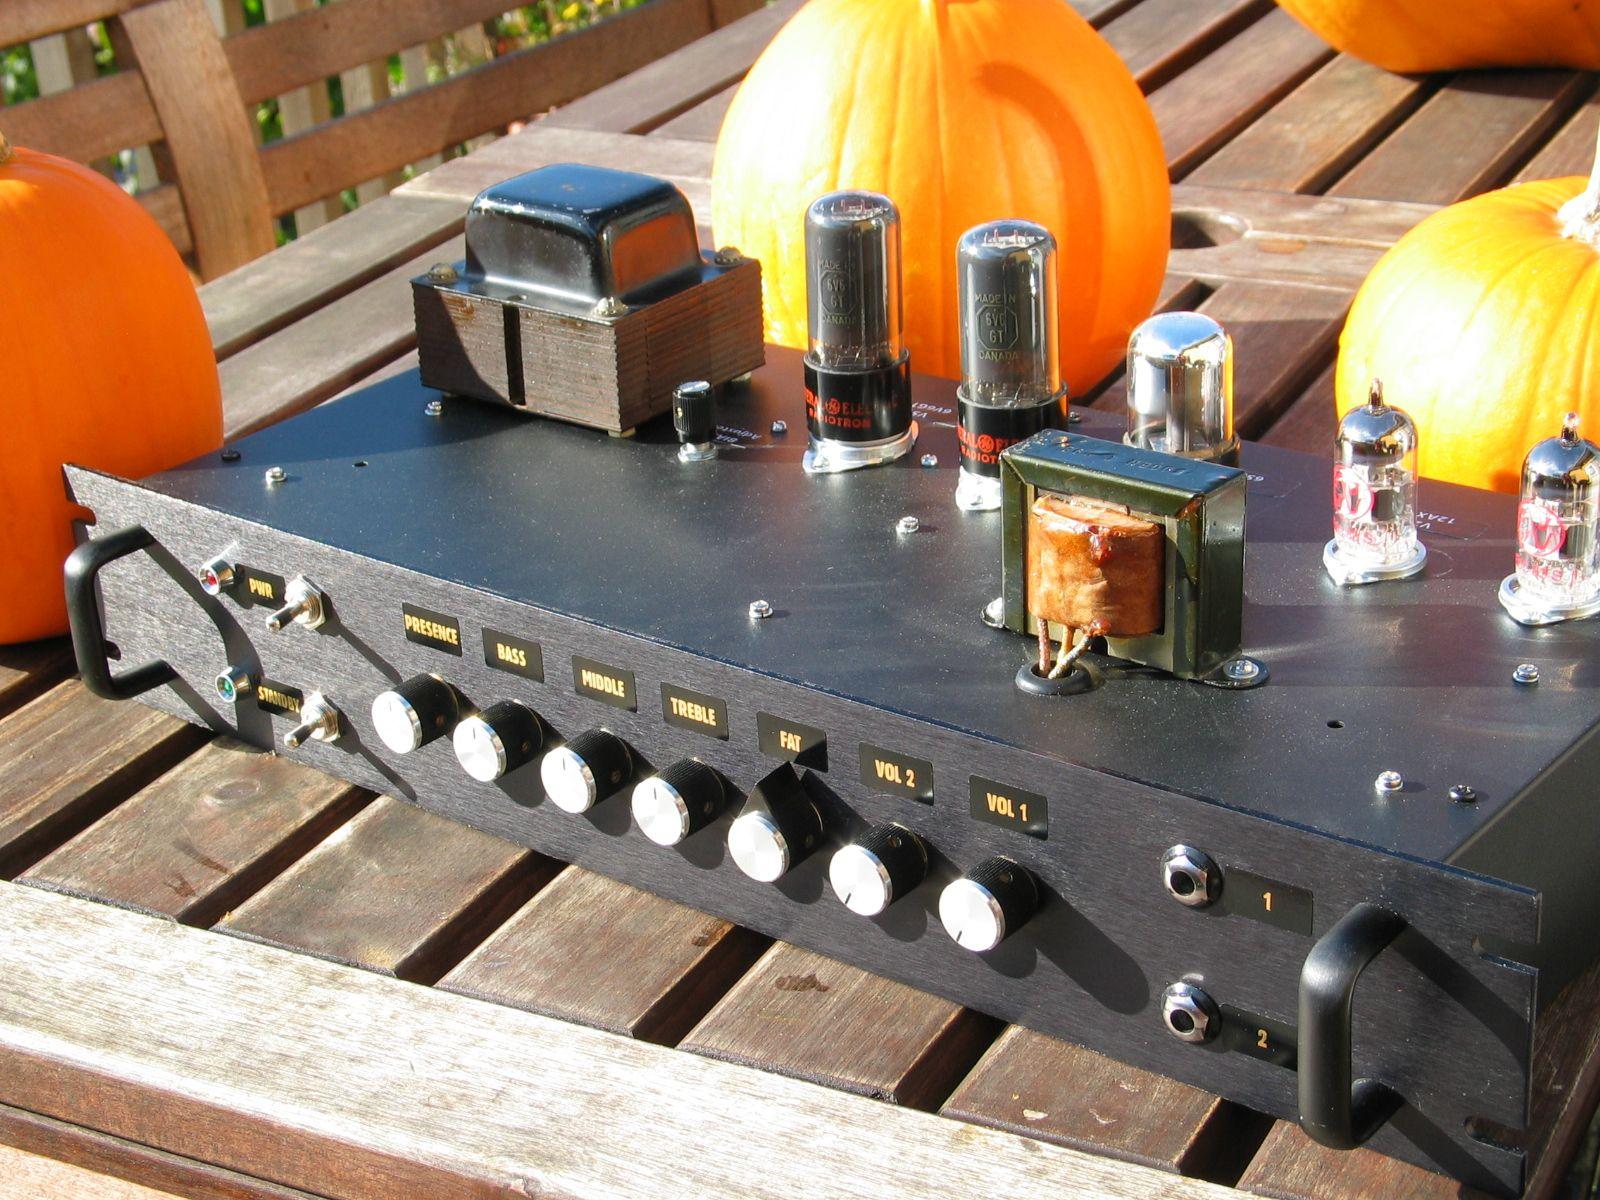 plexi 6v6 tube guitar amp schematic by mark huss diy tube guitar amps pinterest guitar. Black Bedroom Furniture Sets. Home Design Ideas